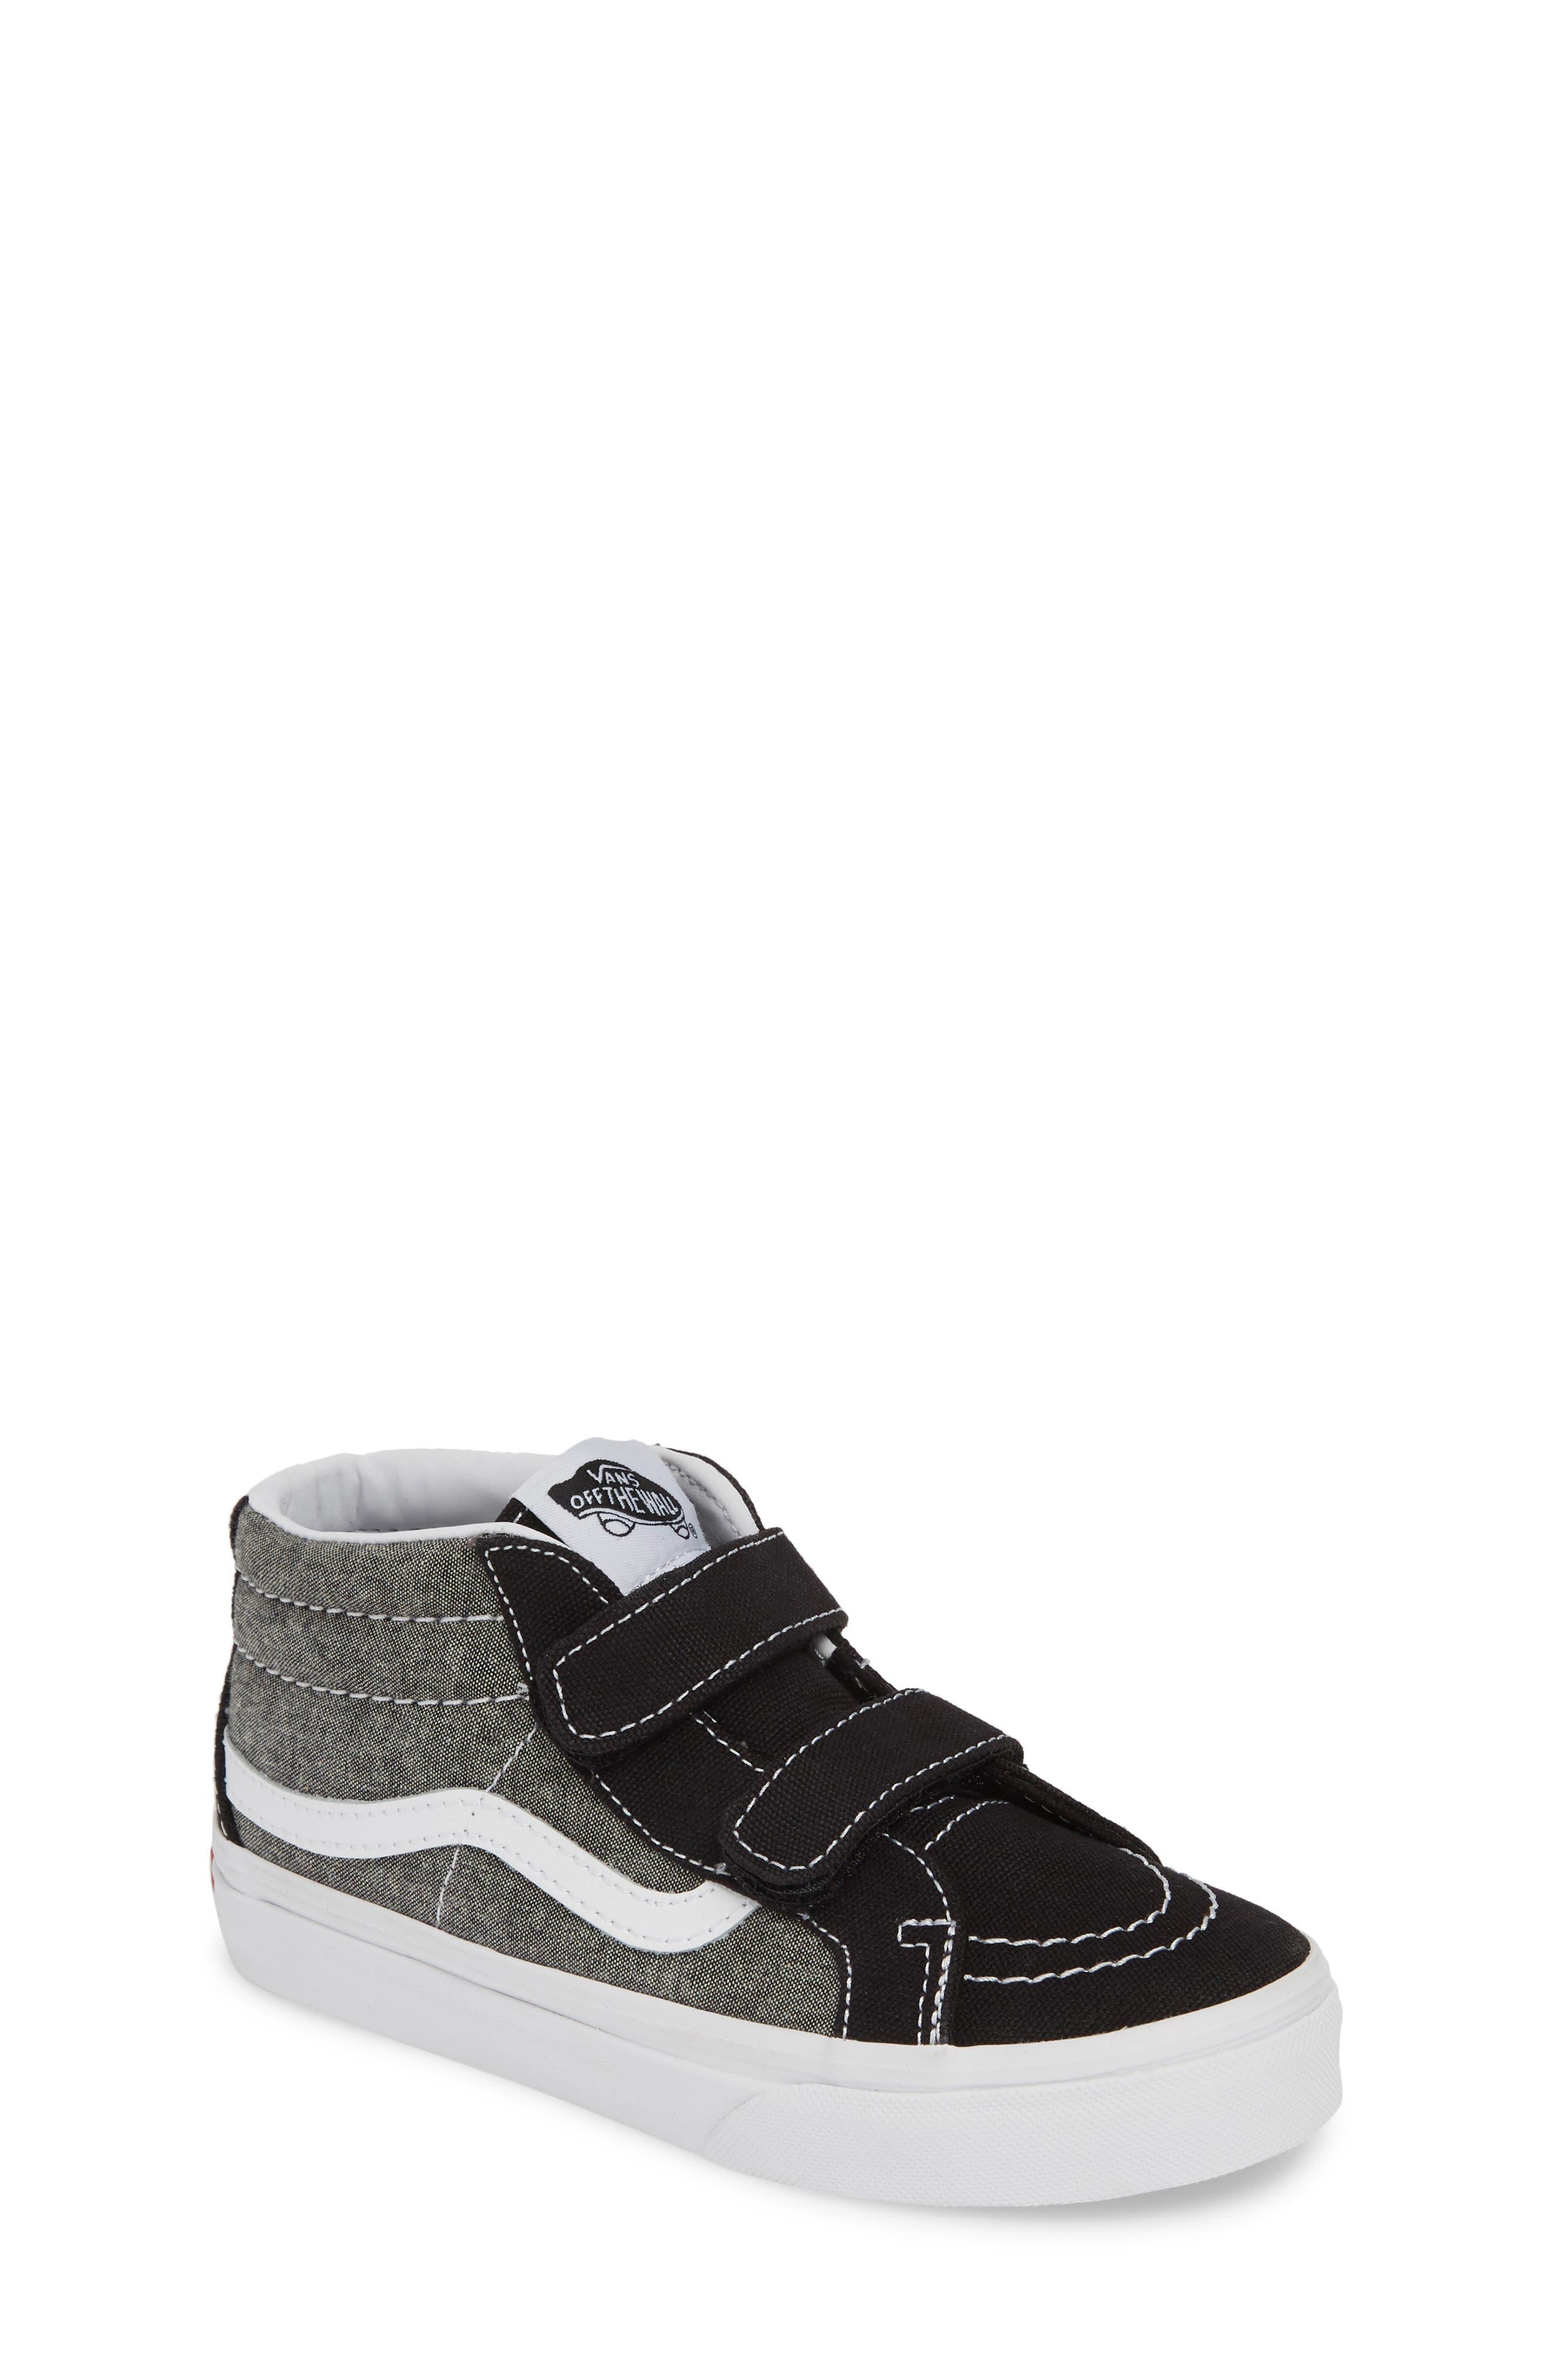 Sk8-Mid Reissue V Sneaker, Main, color, CANVAS BLACK/ TRUE WHITE